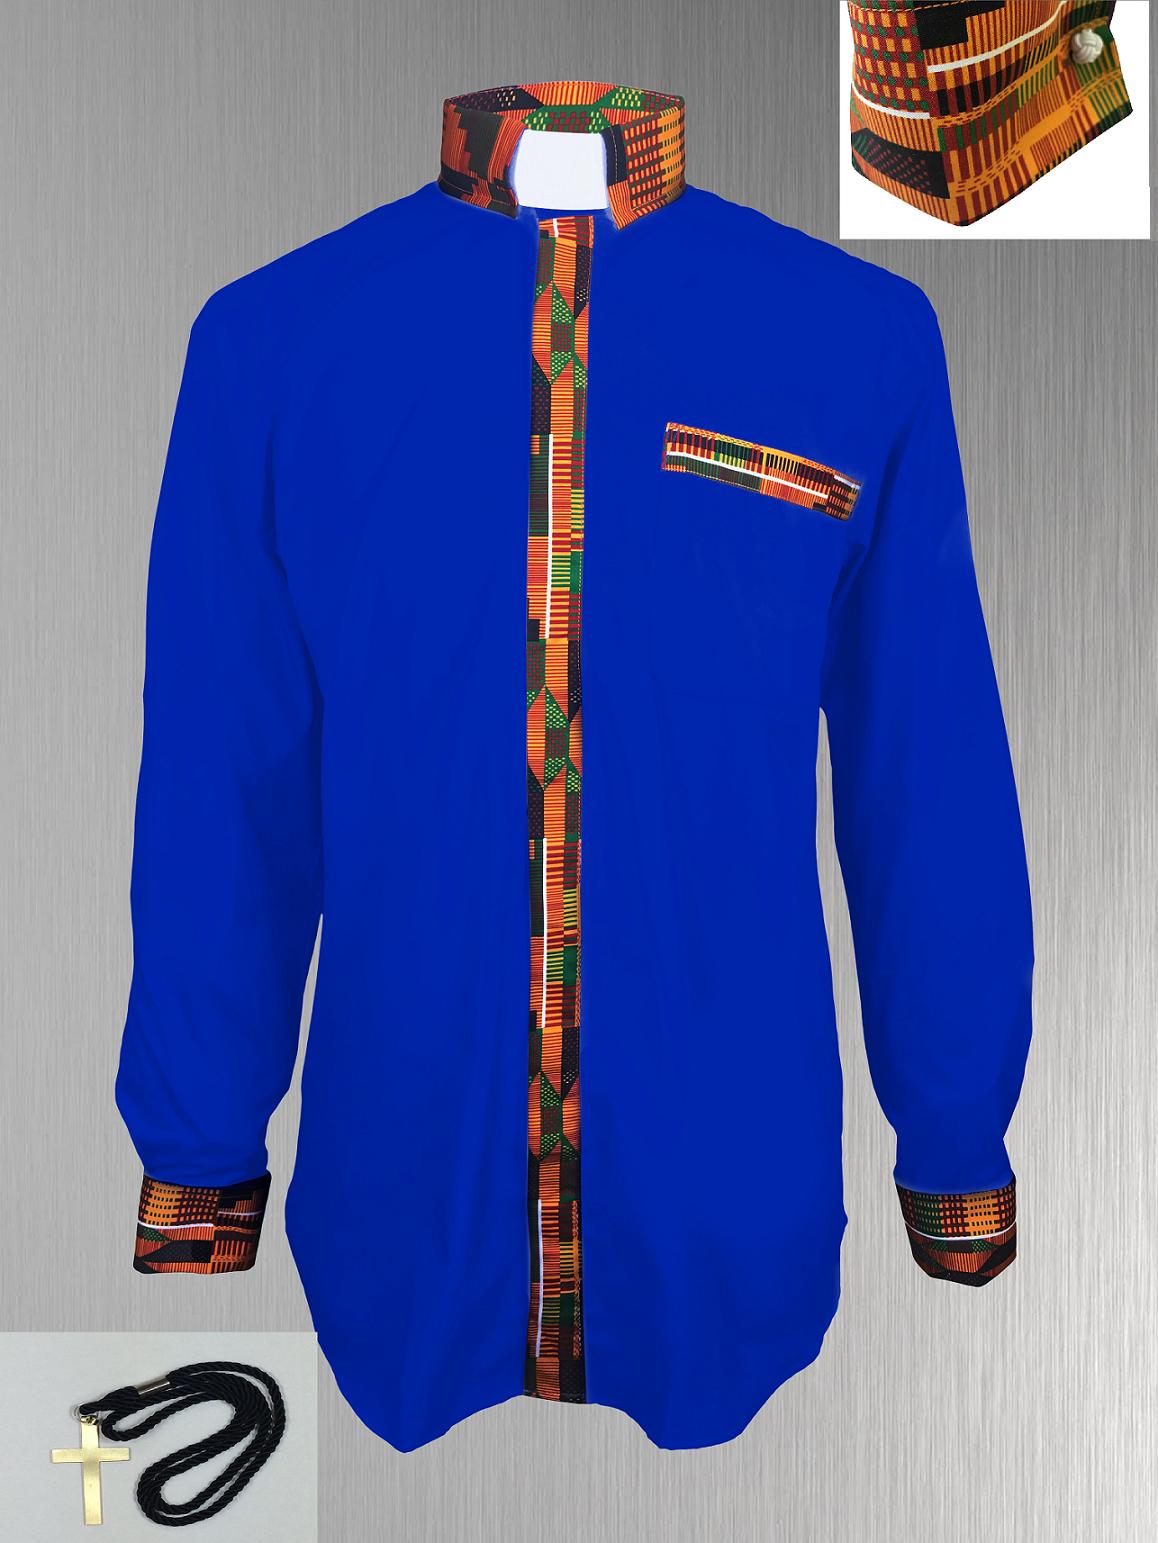 Royal Blue Clergy Shirt with Kente Cloth